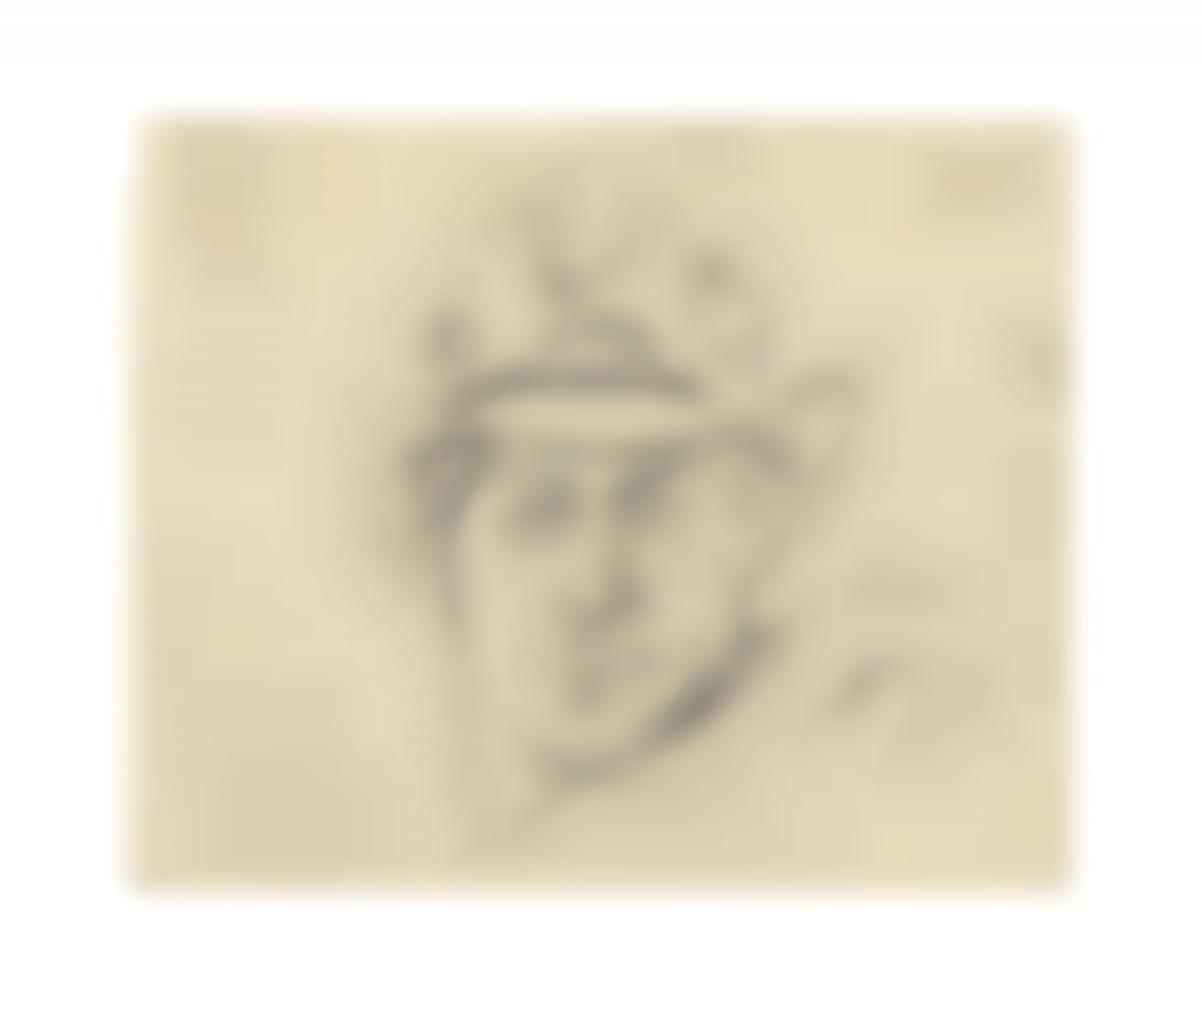 Larry Rivers-De Kooning With My Texas Hat-1963